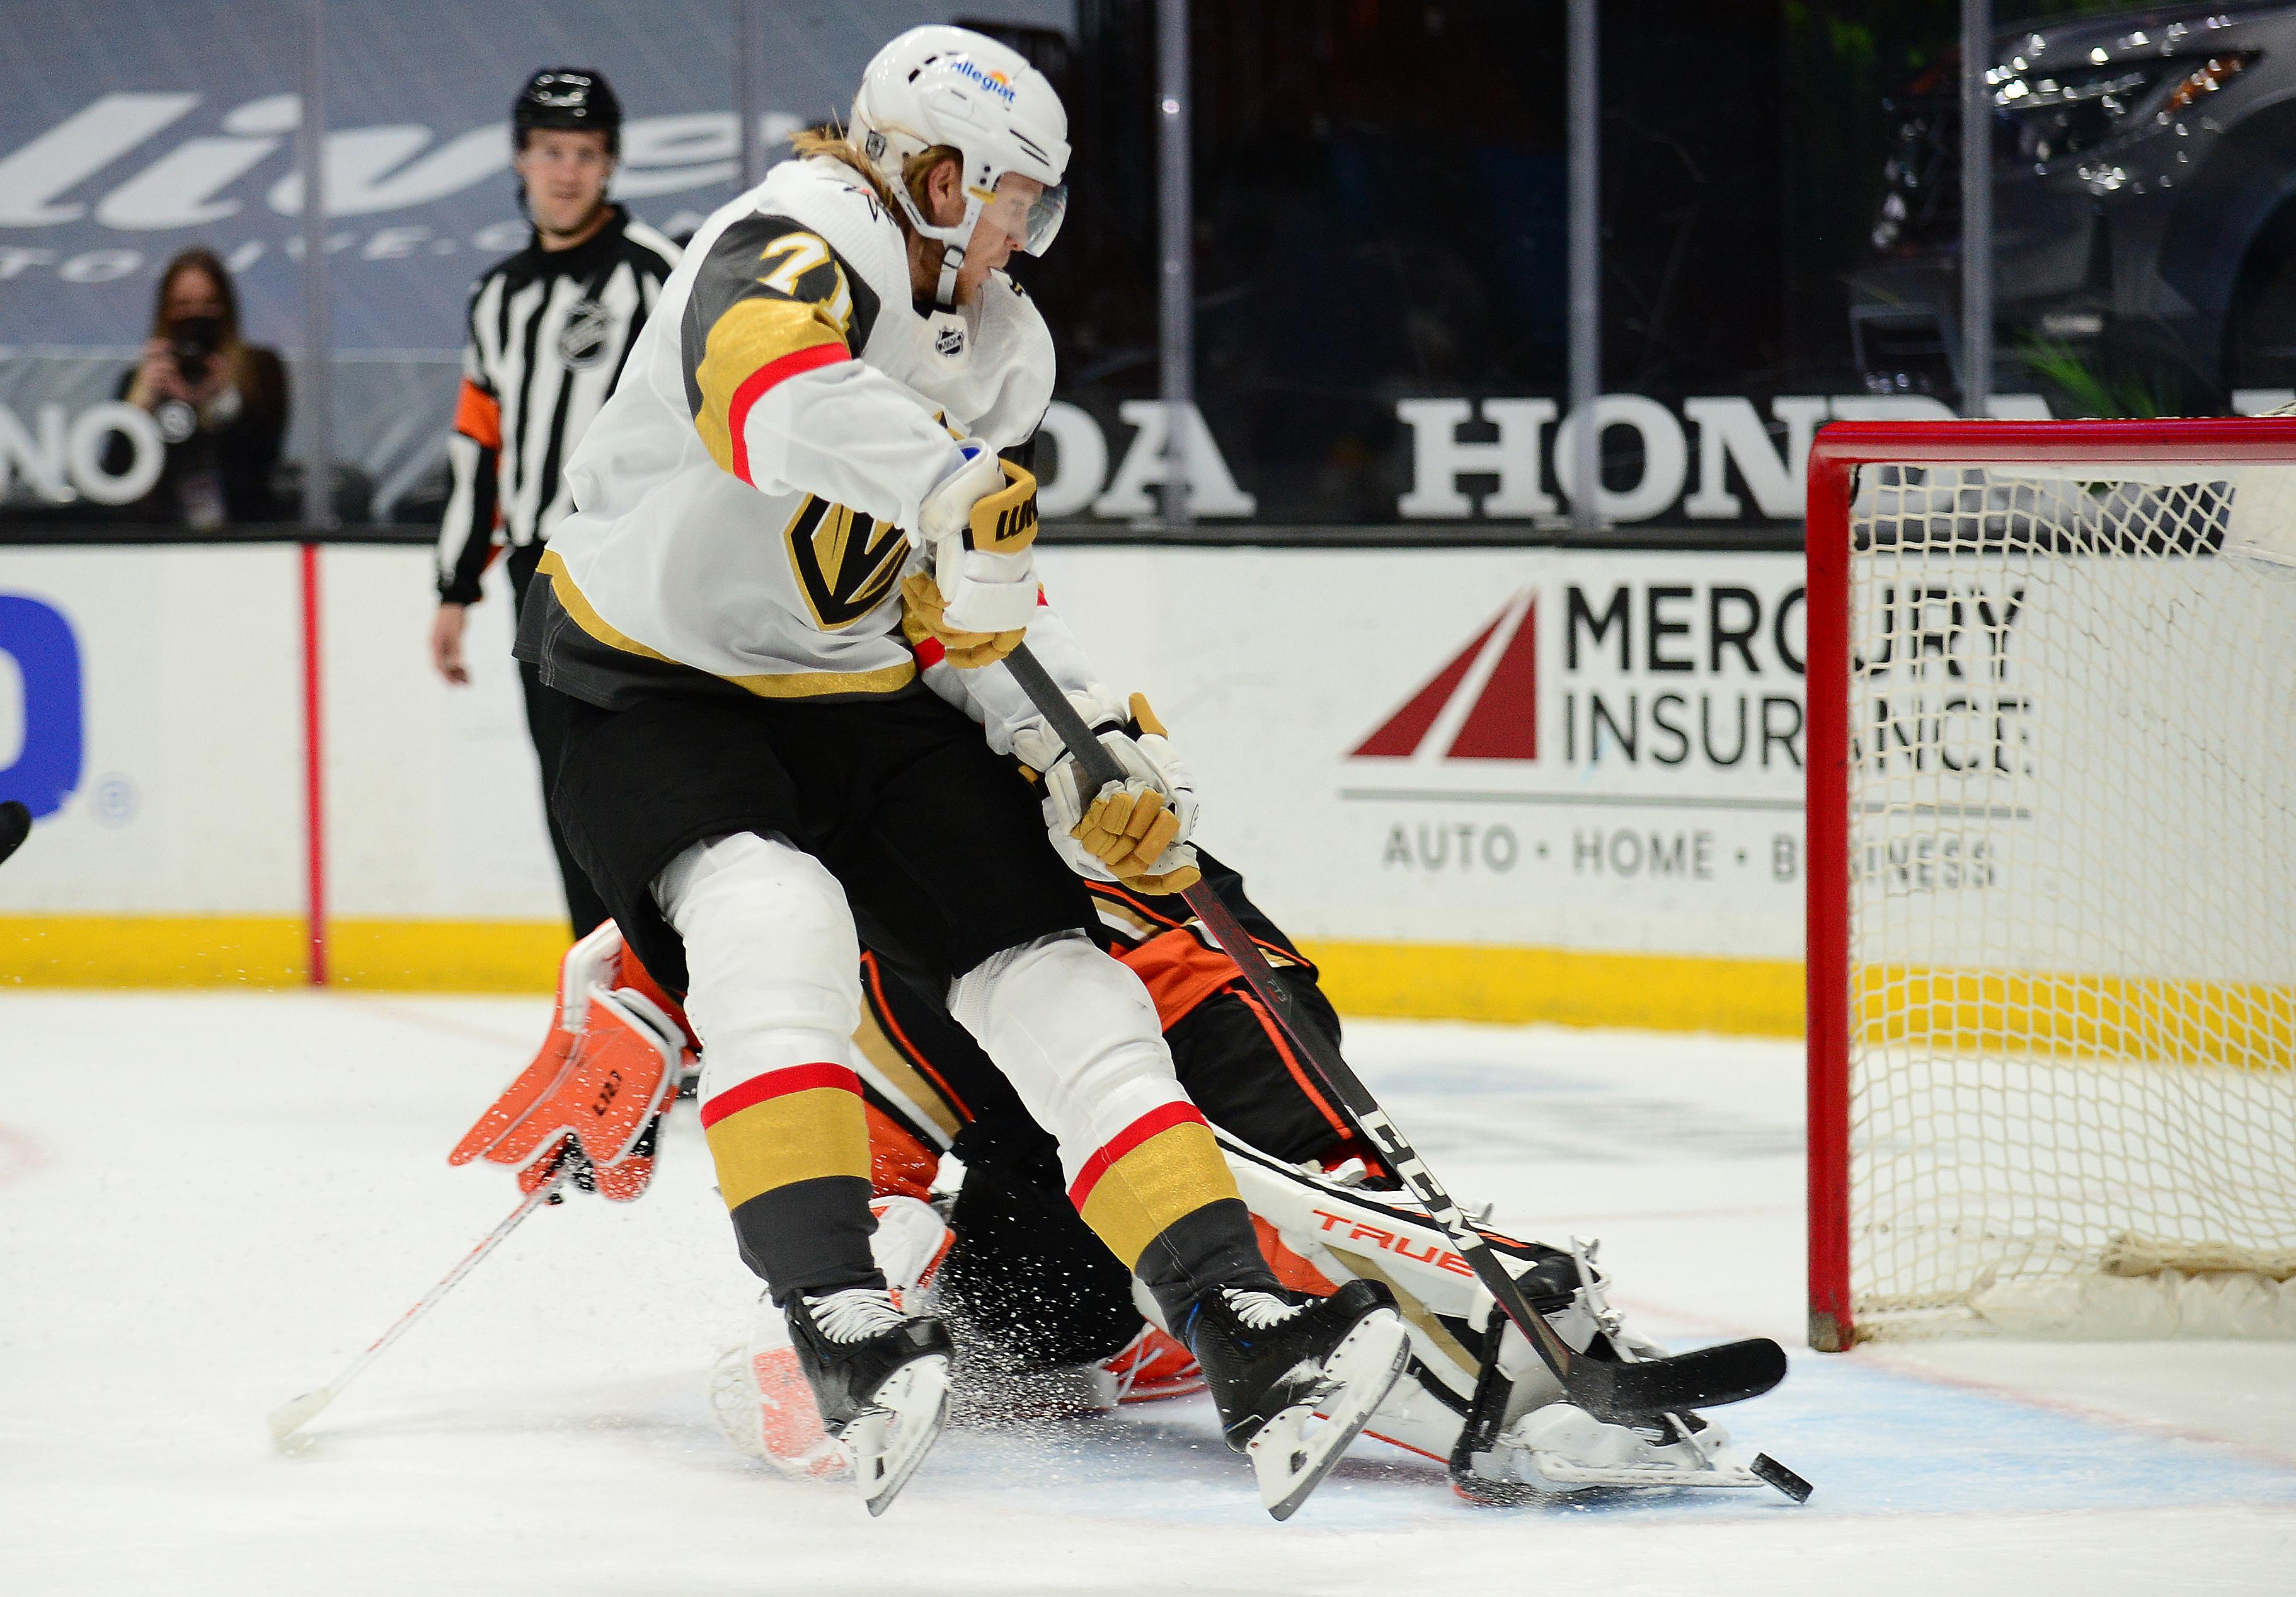 Feb 27, 2021; Anaheim, California, USA; Vegas Golden Knights center William Karlsson (71) scores a goal against Anaheim Ducks goaltender John Gibson (36) during overtime at Honda Center. Mandatory Credit: Gary A. Vasquez-USA TODAY Sports